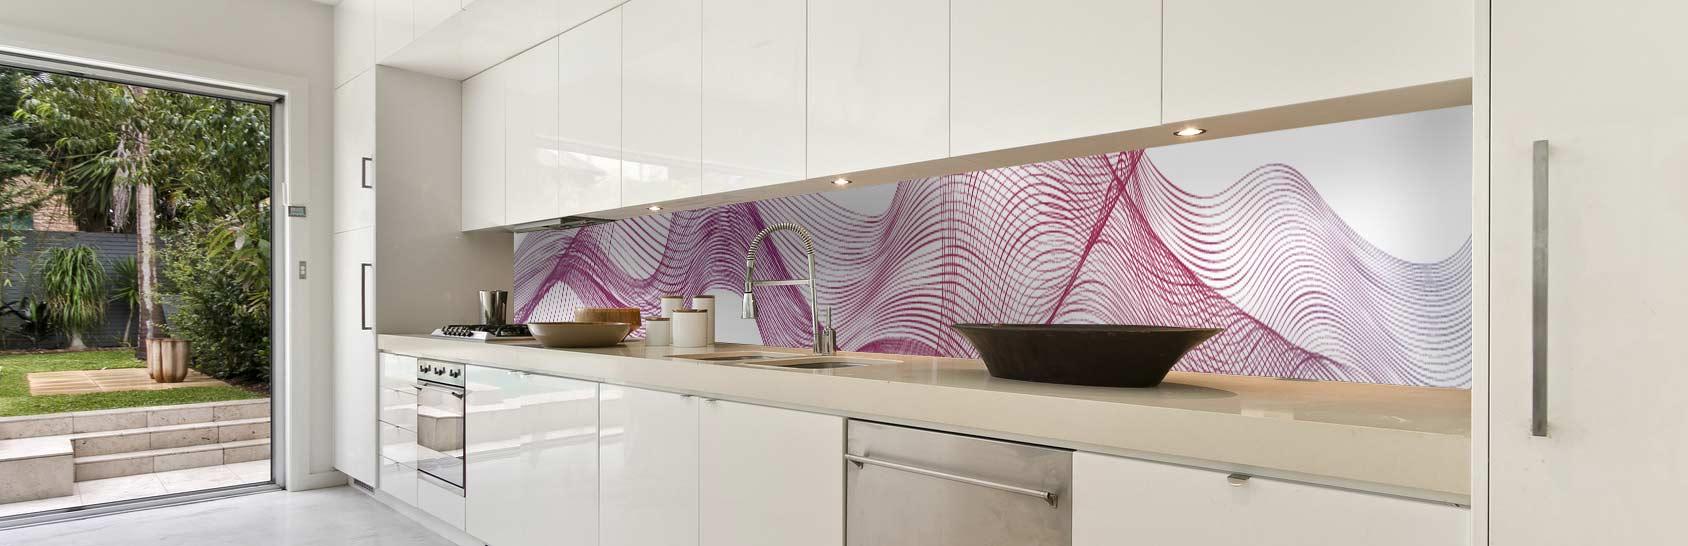 Fototapeta do kuchyne vlna